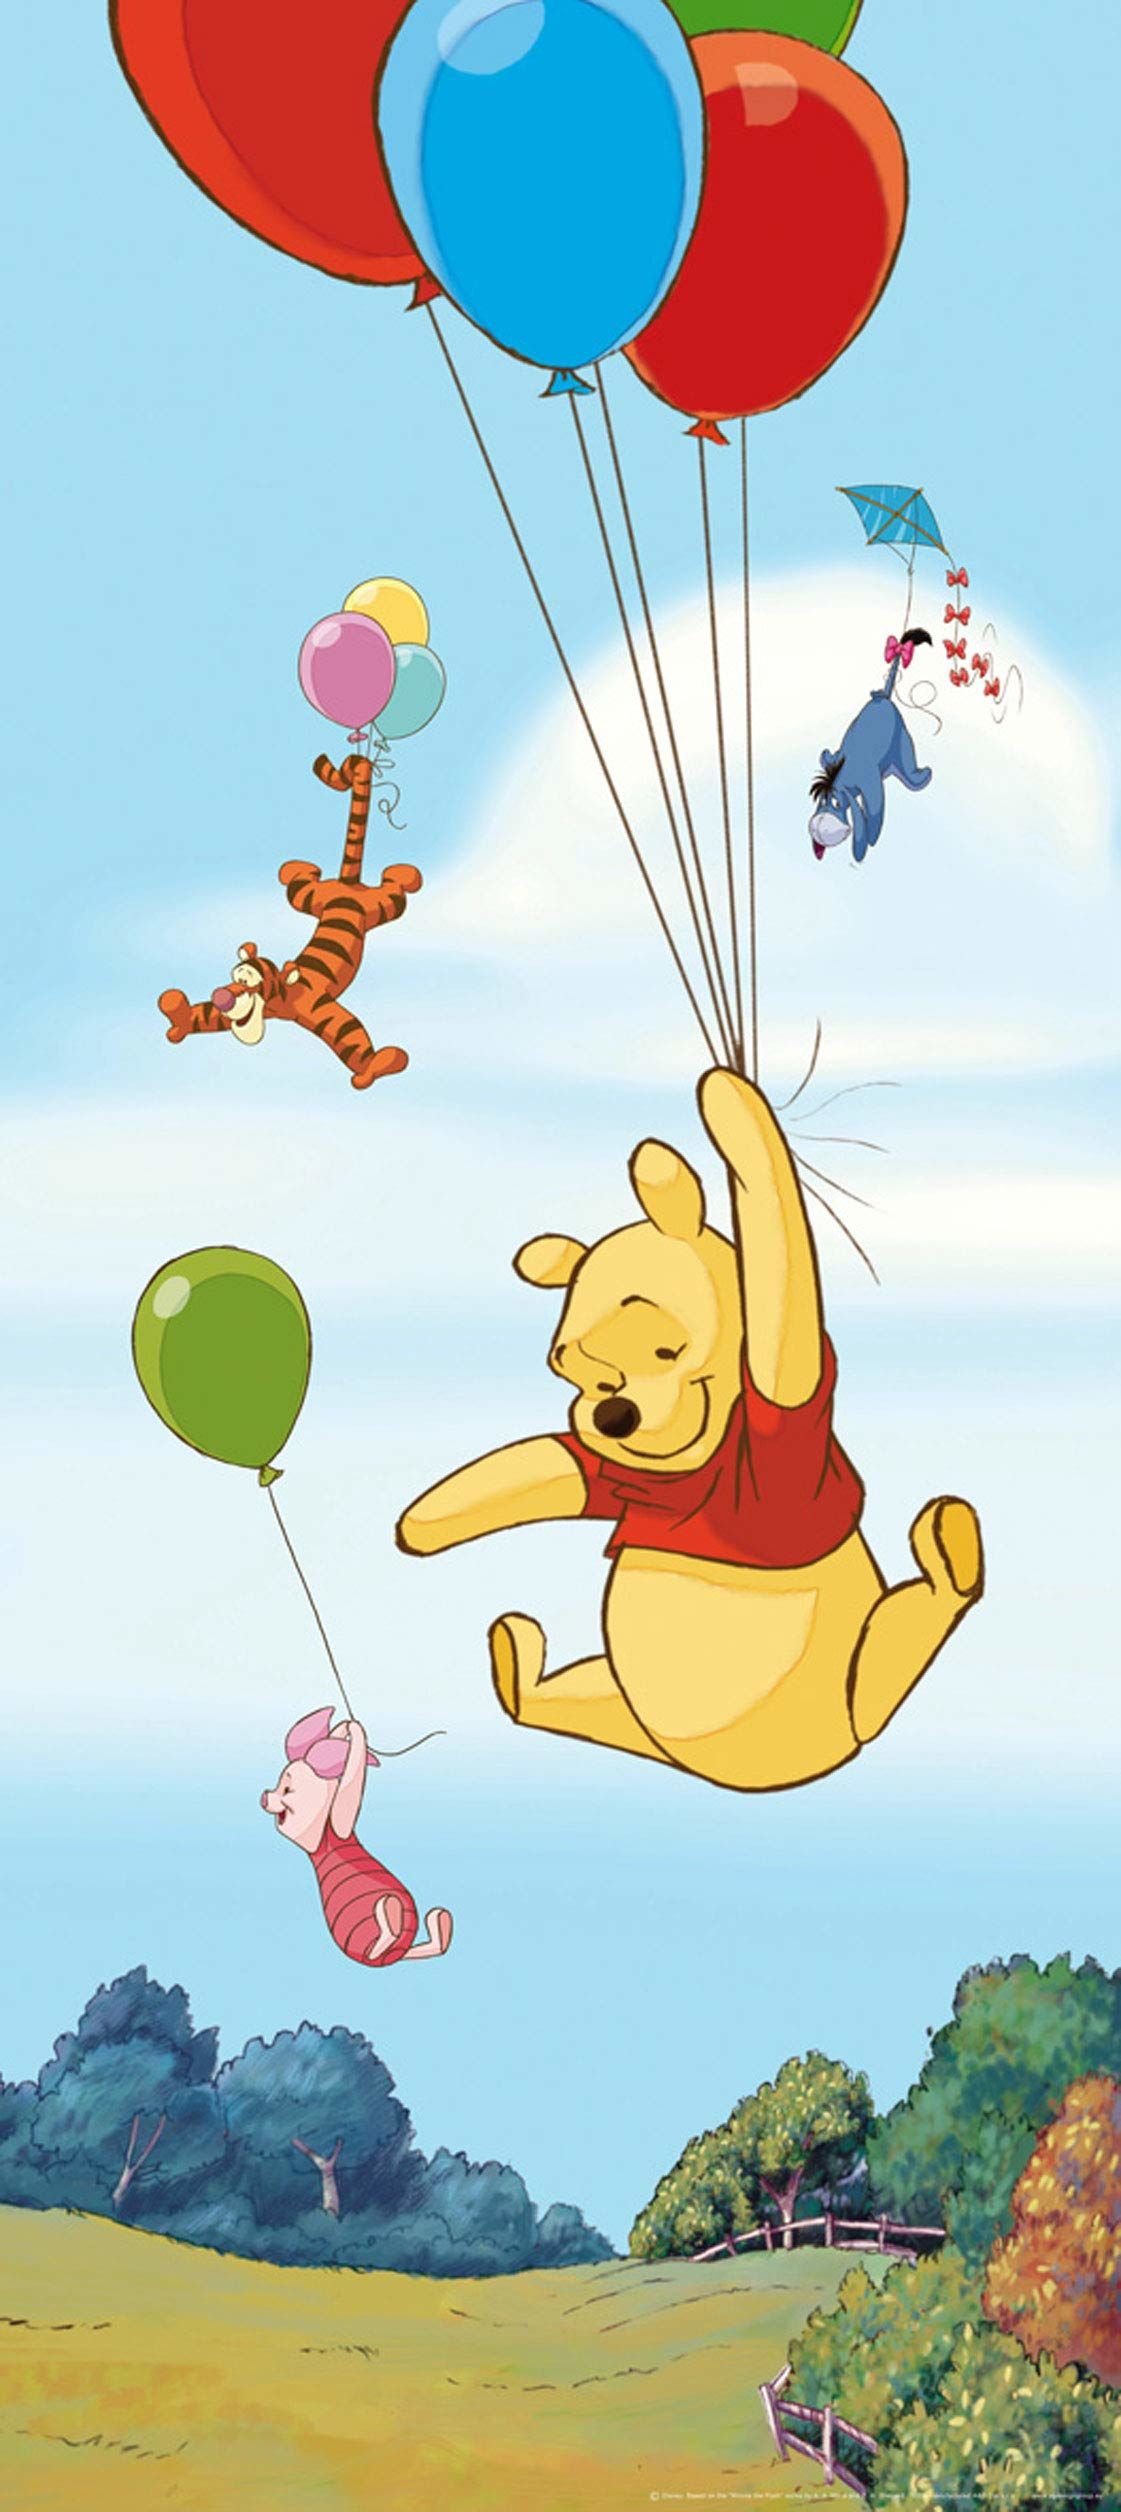 Fototapeta FTDNv5461 Photomurals Disney Winnie The Pooh